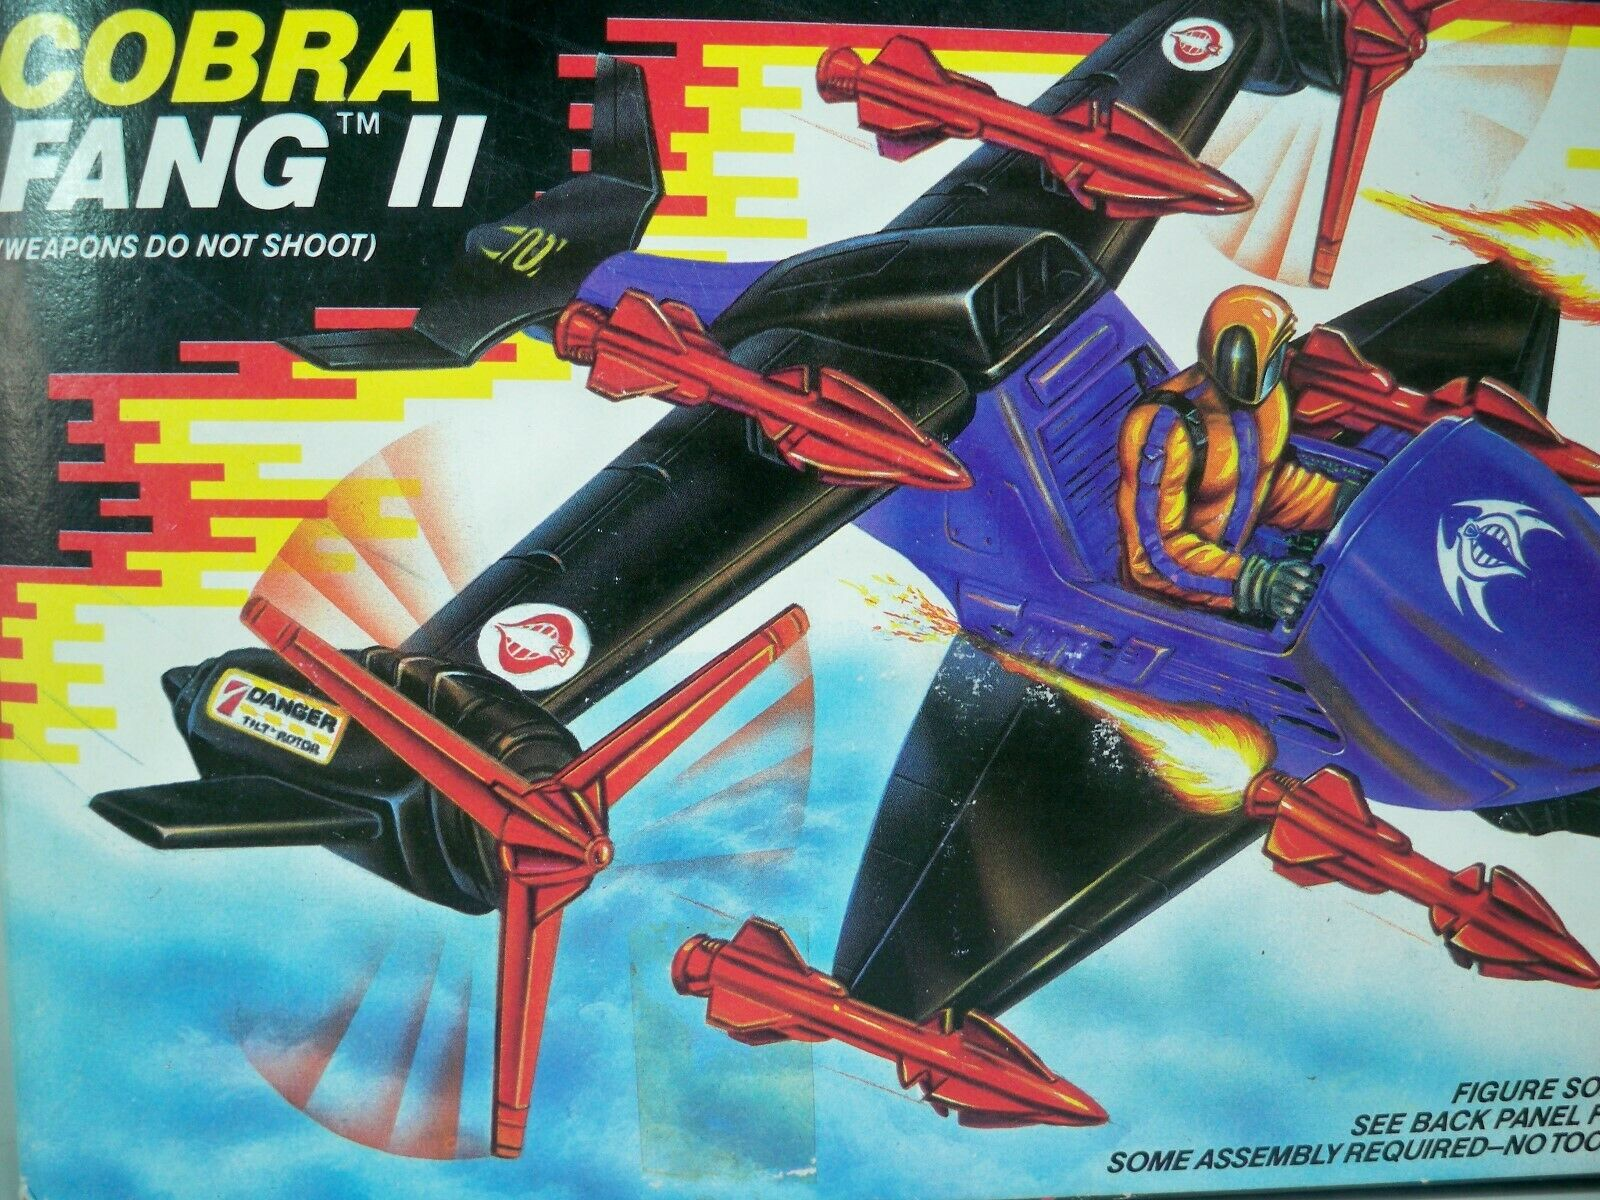 K1905221 COBRA FANG II 2 MISB MINT IN SEALED BOX GI JOE VINTAGE 1988 ORIGINAL